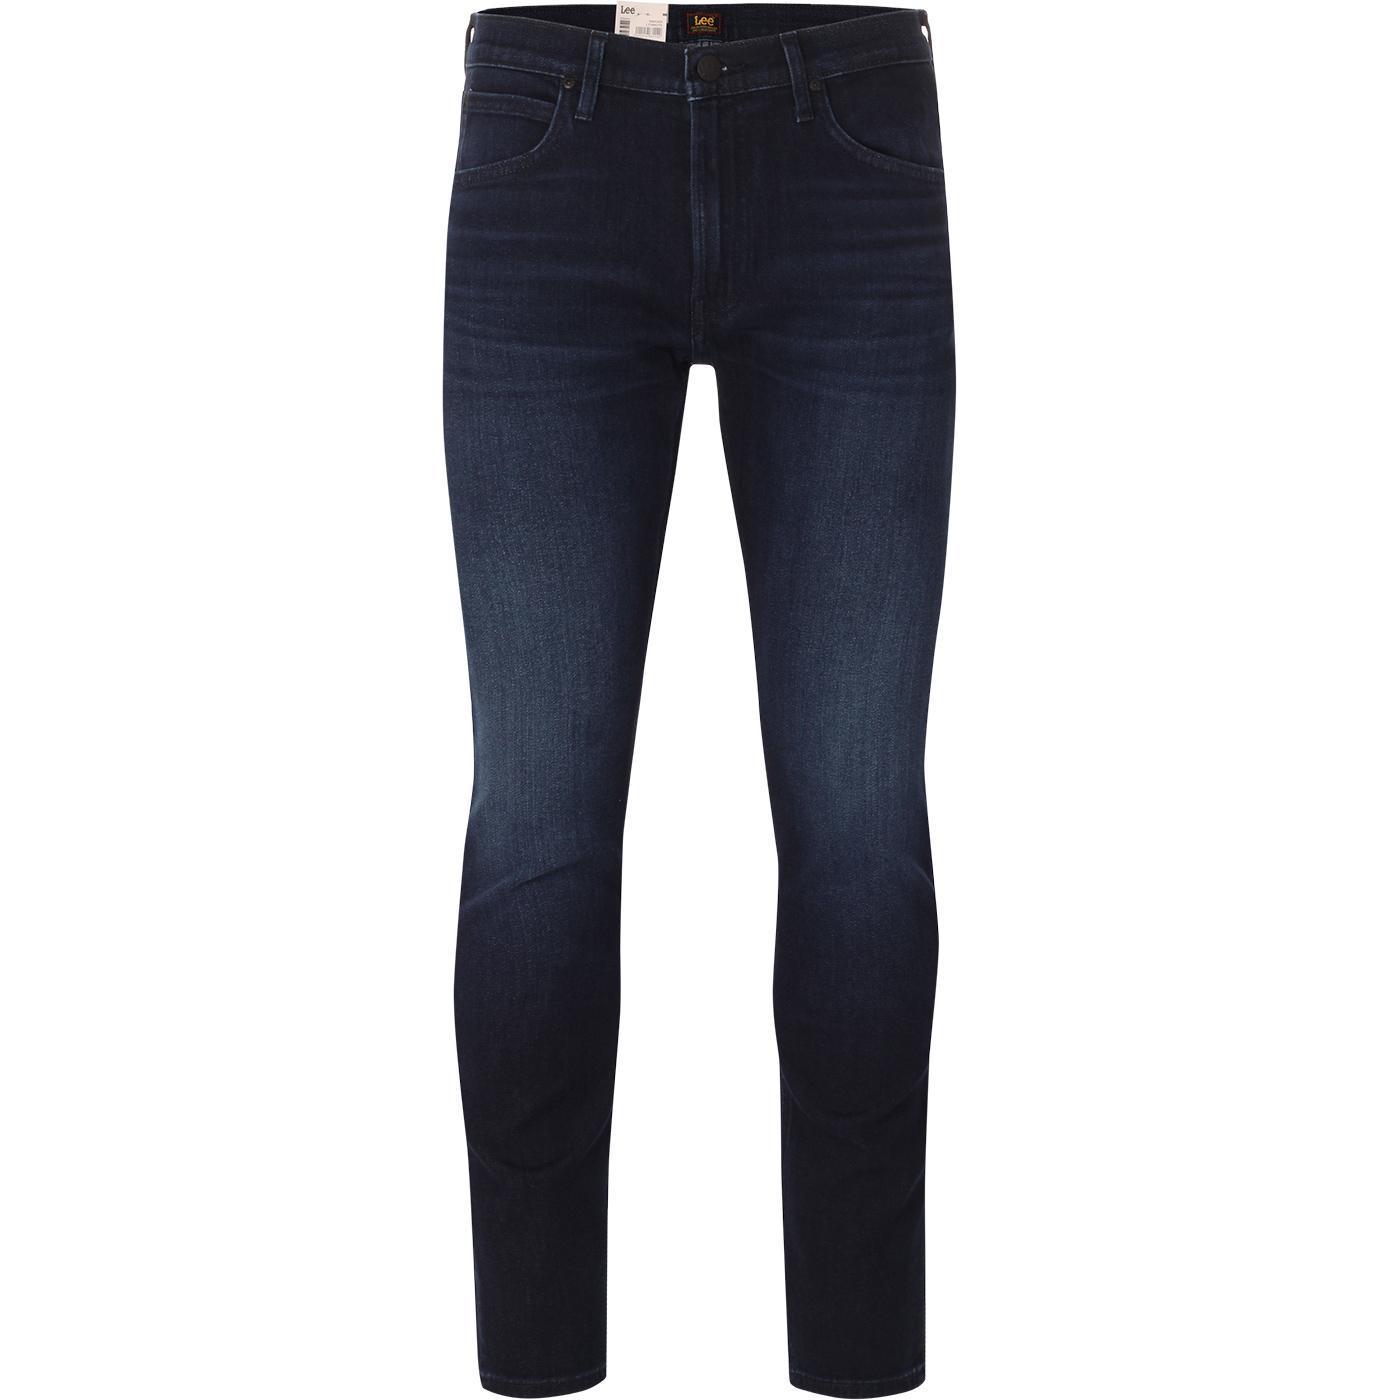 Luke LEE JEANS Slim Tapered Organic Cotton Jeans